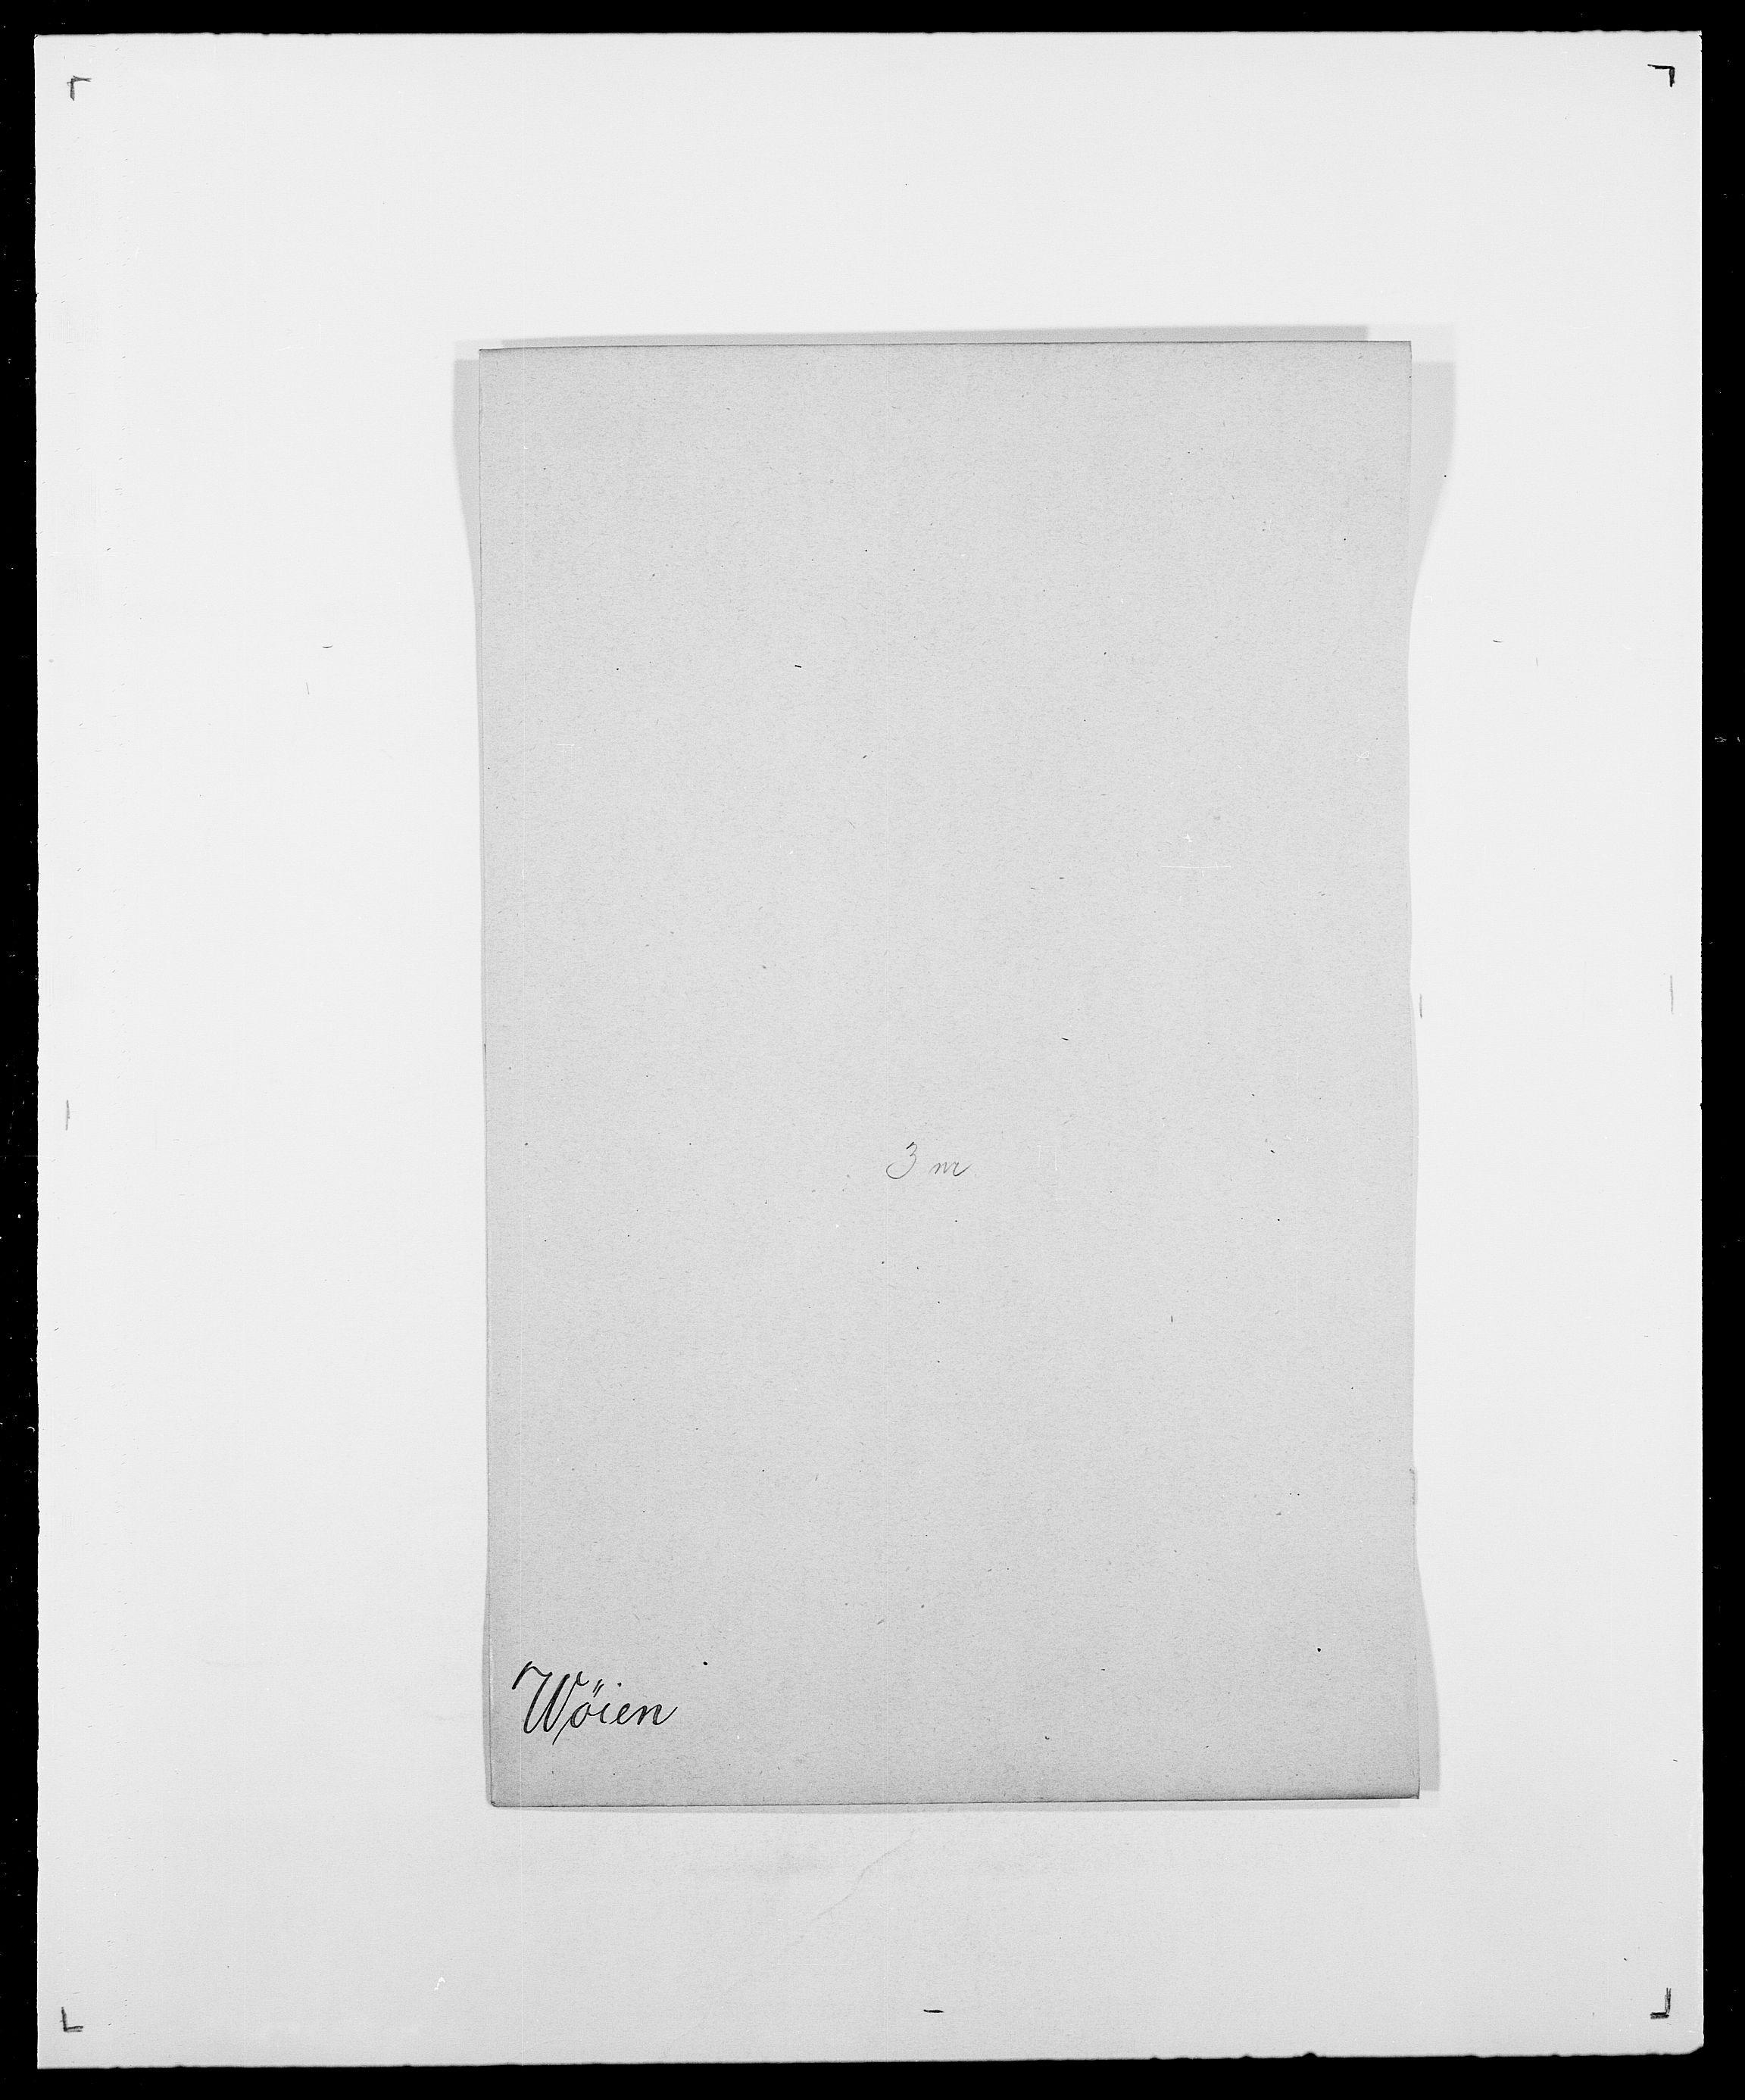 SAO, Delgobe, Charles Antoine - samling, D/Da/L0043: Wulfsberg - v. Zanten, s. 34